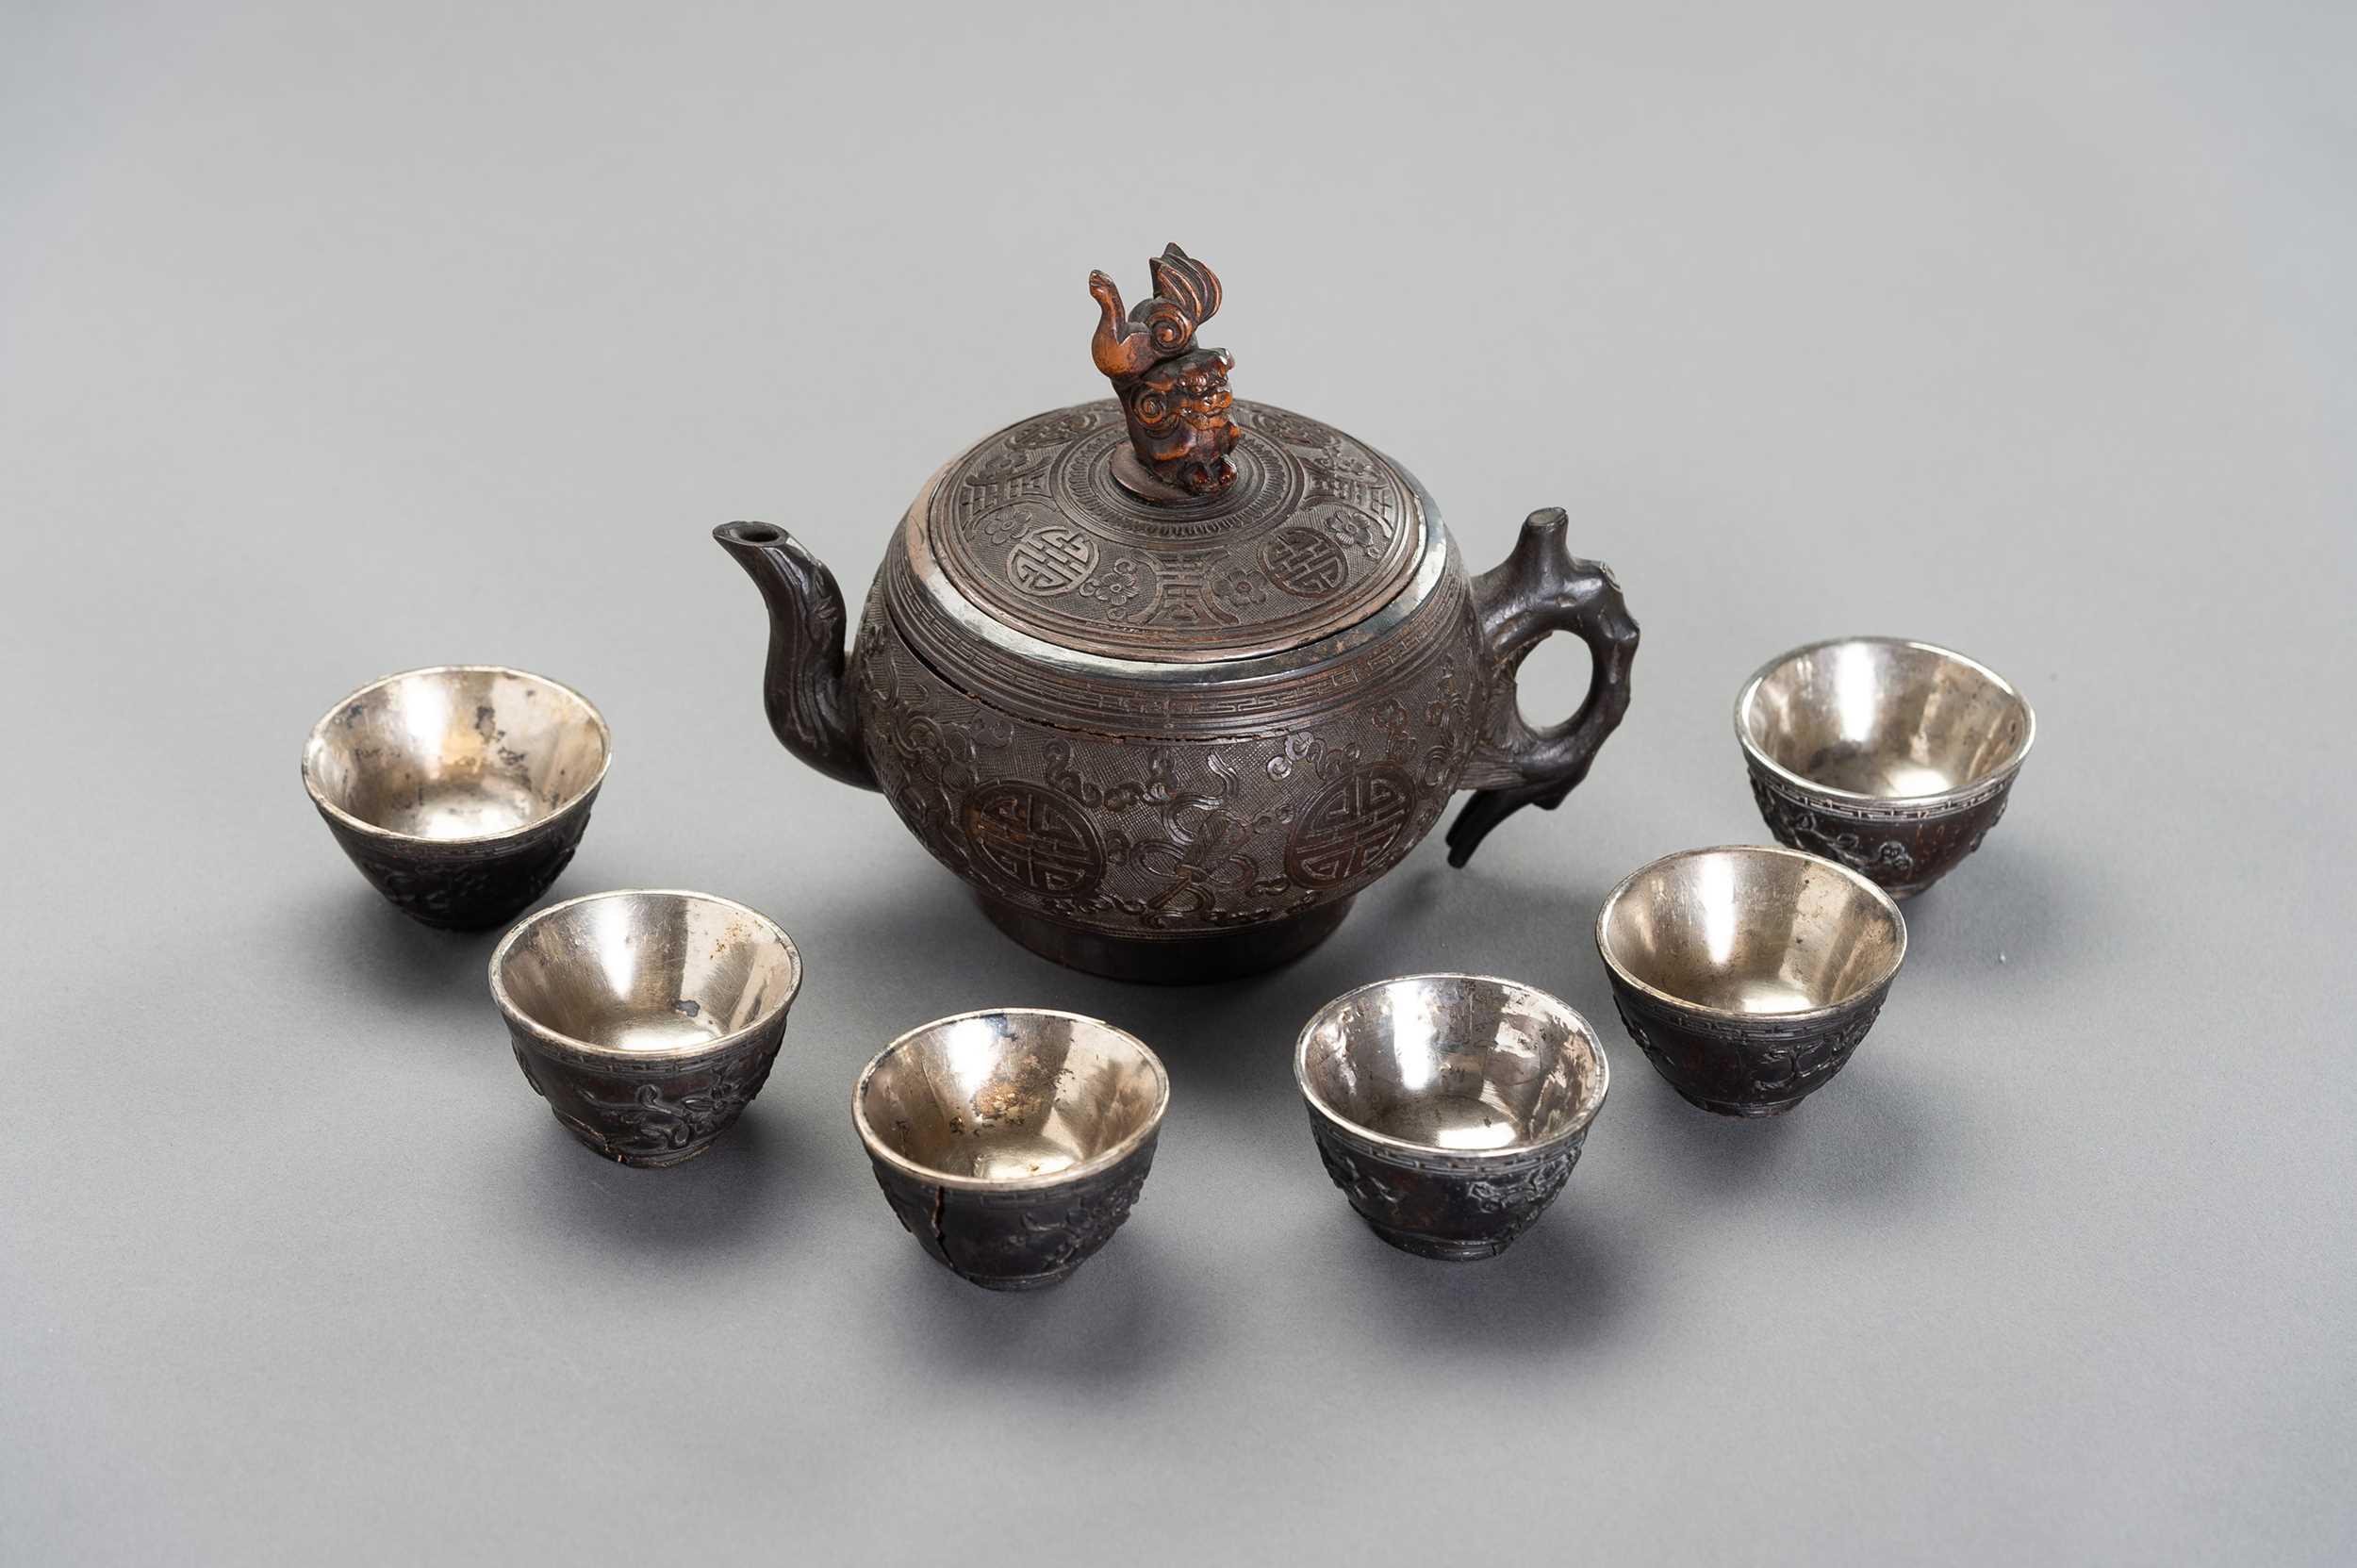 Lot 93 - A CONONUT AND SILVER TEA SET